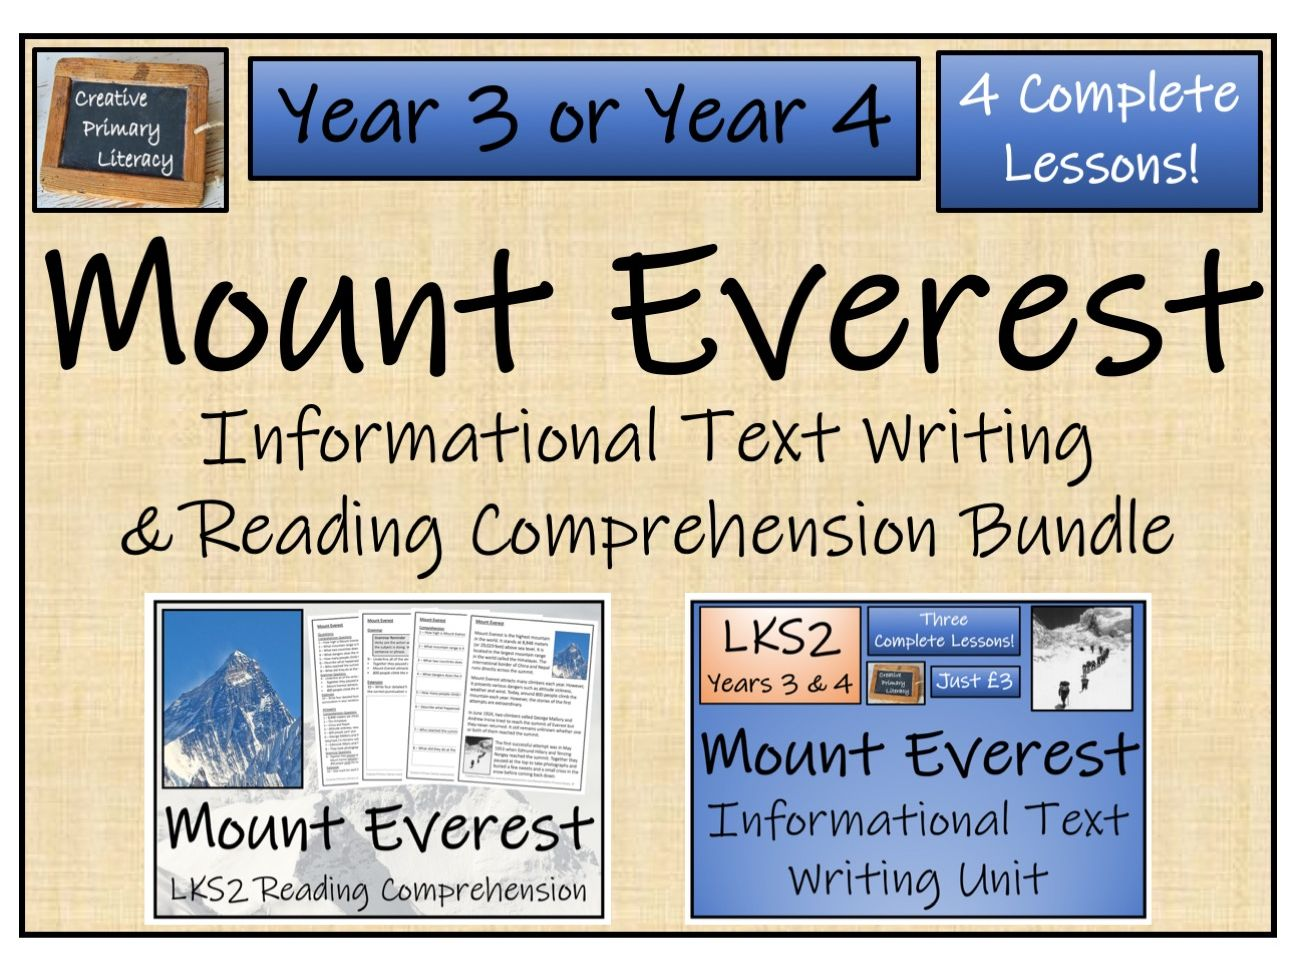 LKS2 - Mount Everest Reading Comprehension & Informational Text Writing Bundle